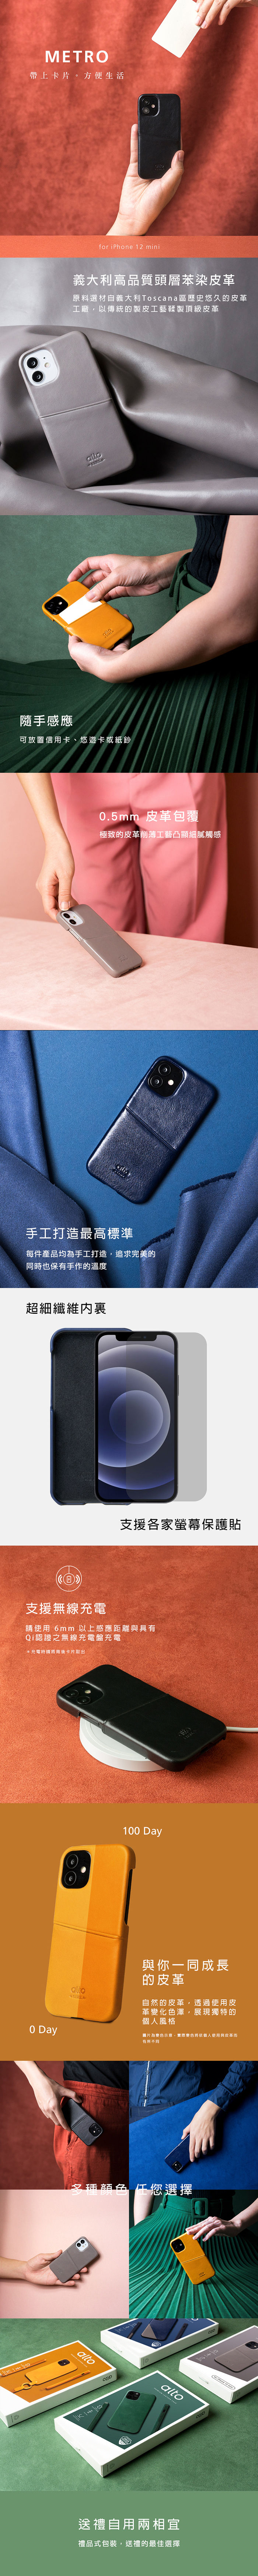 Alto iPhone 12 mini 5.4吋 插卡皮革手機殼背蓋 Metro (礫石灰)